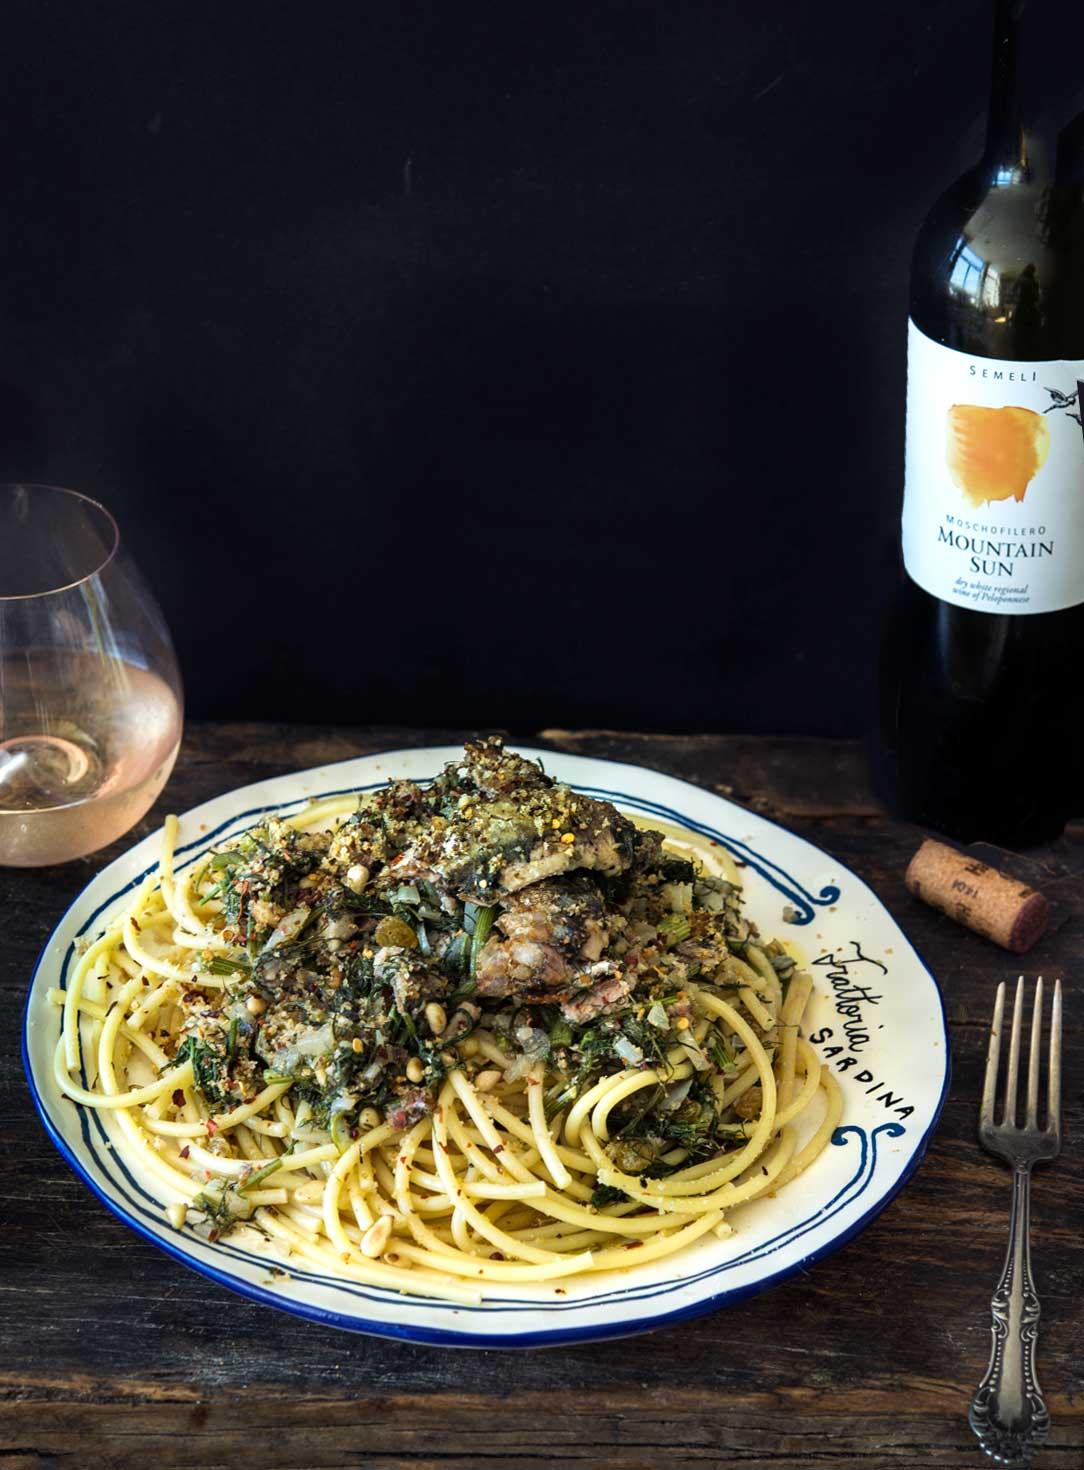 Sardine Recipes for Sardine Lovers